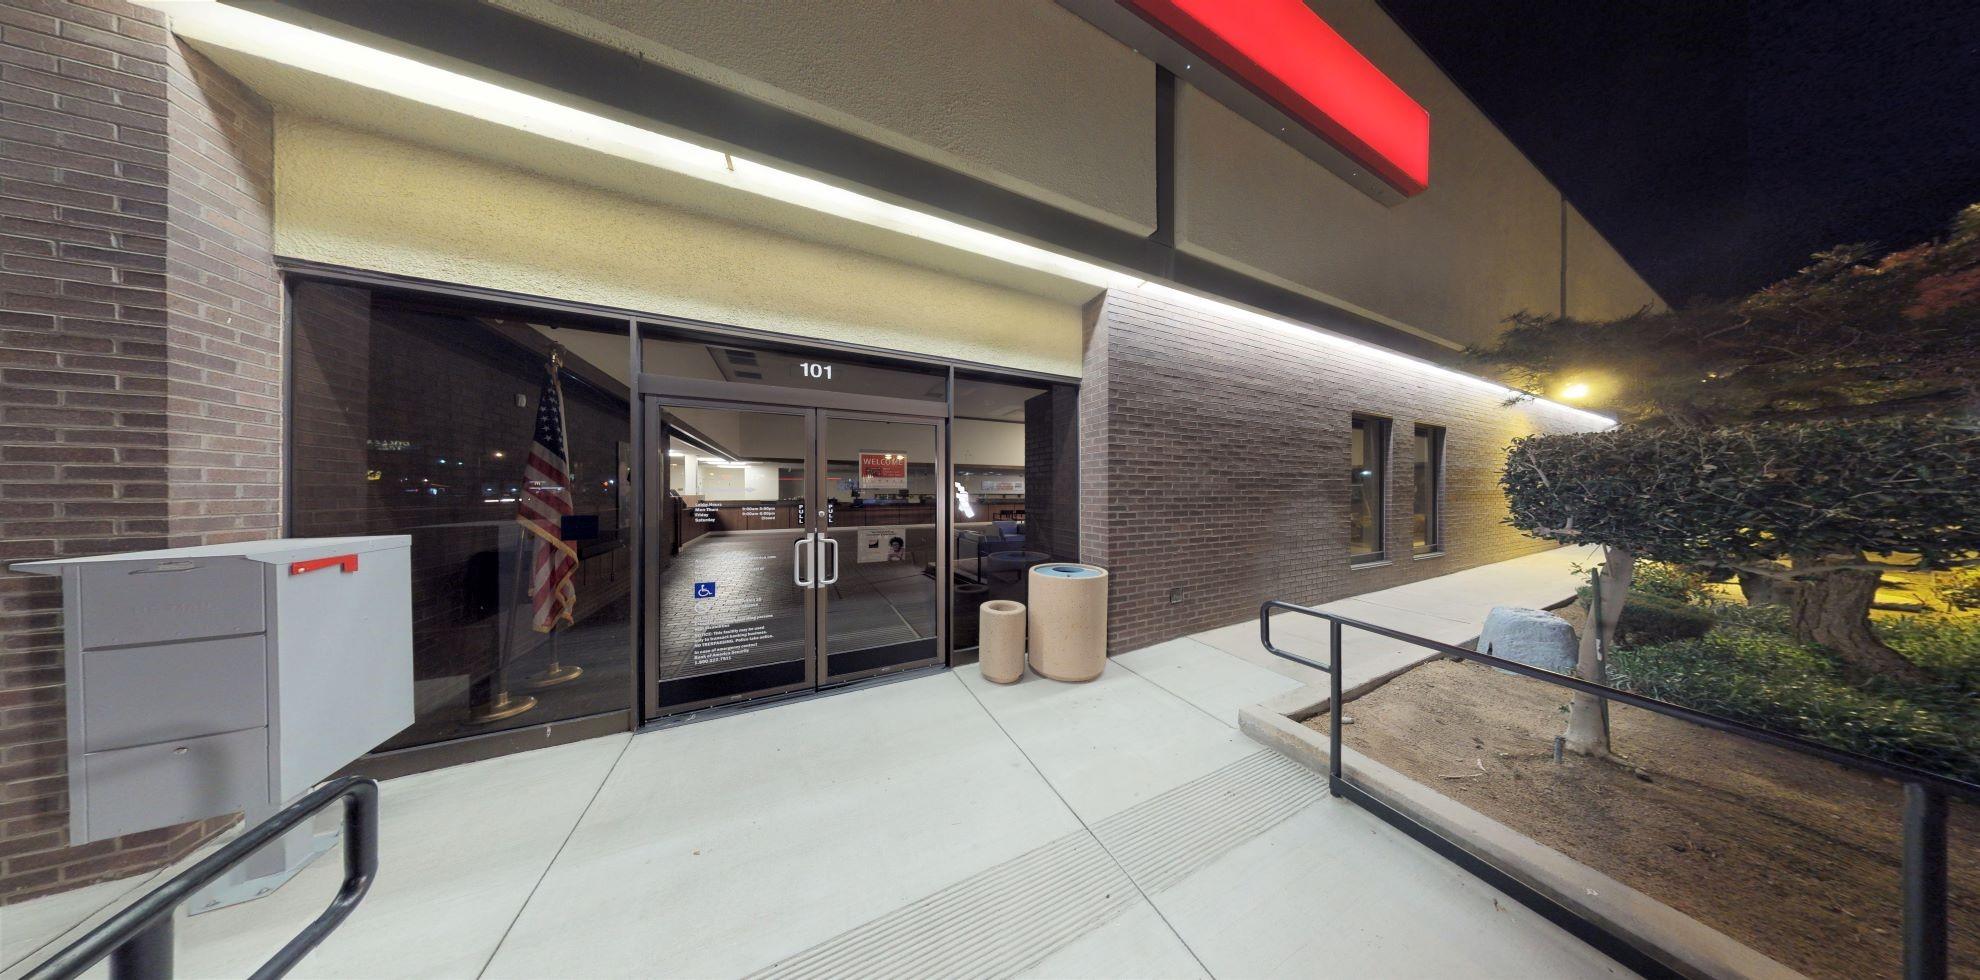 Bank of America financial center with drive-thru ATM   101 W Ridgecrest Blvd, Ridgecrest, CA 93555